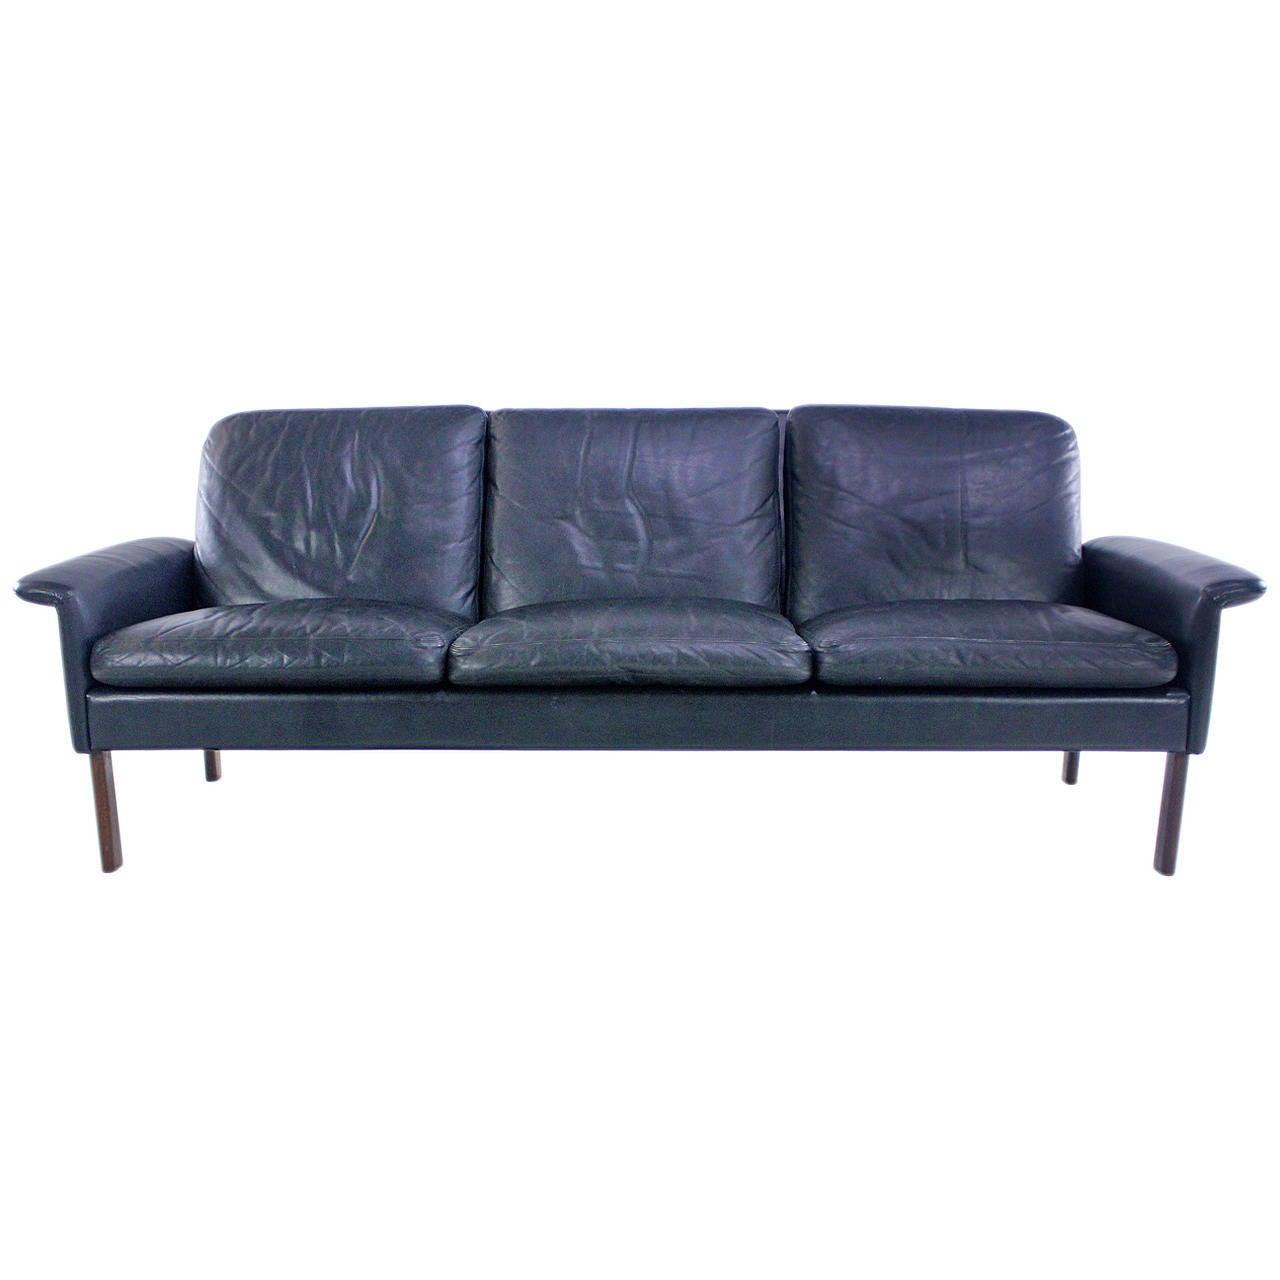 classic danish modern three place black leather sofa at